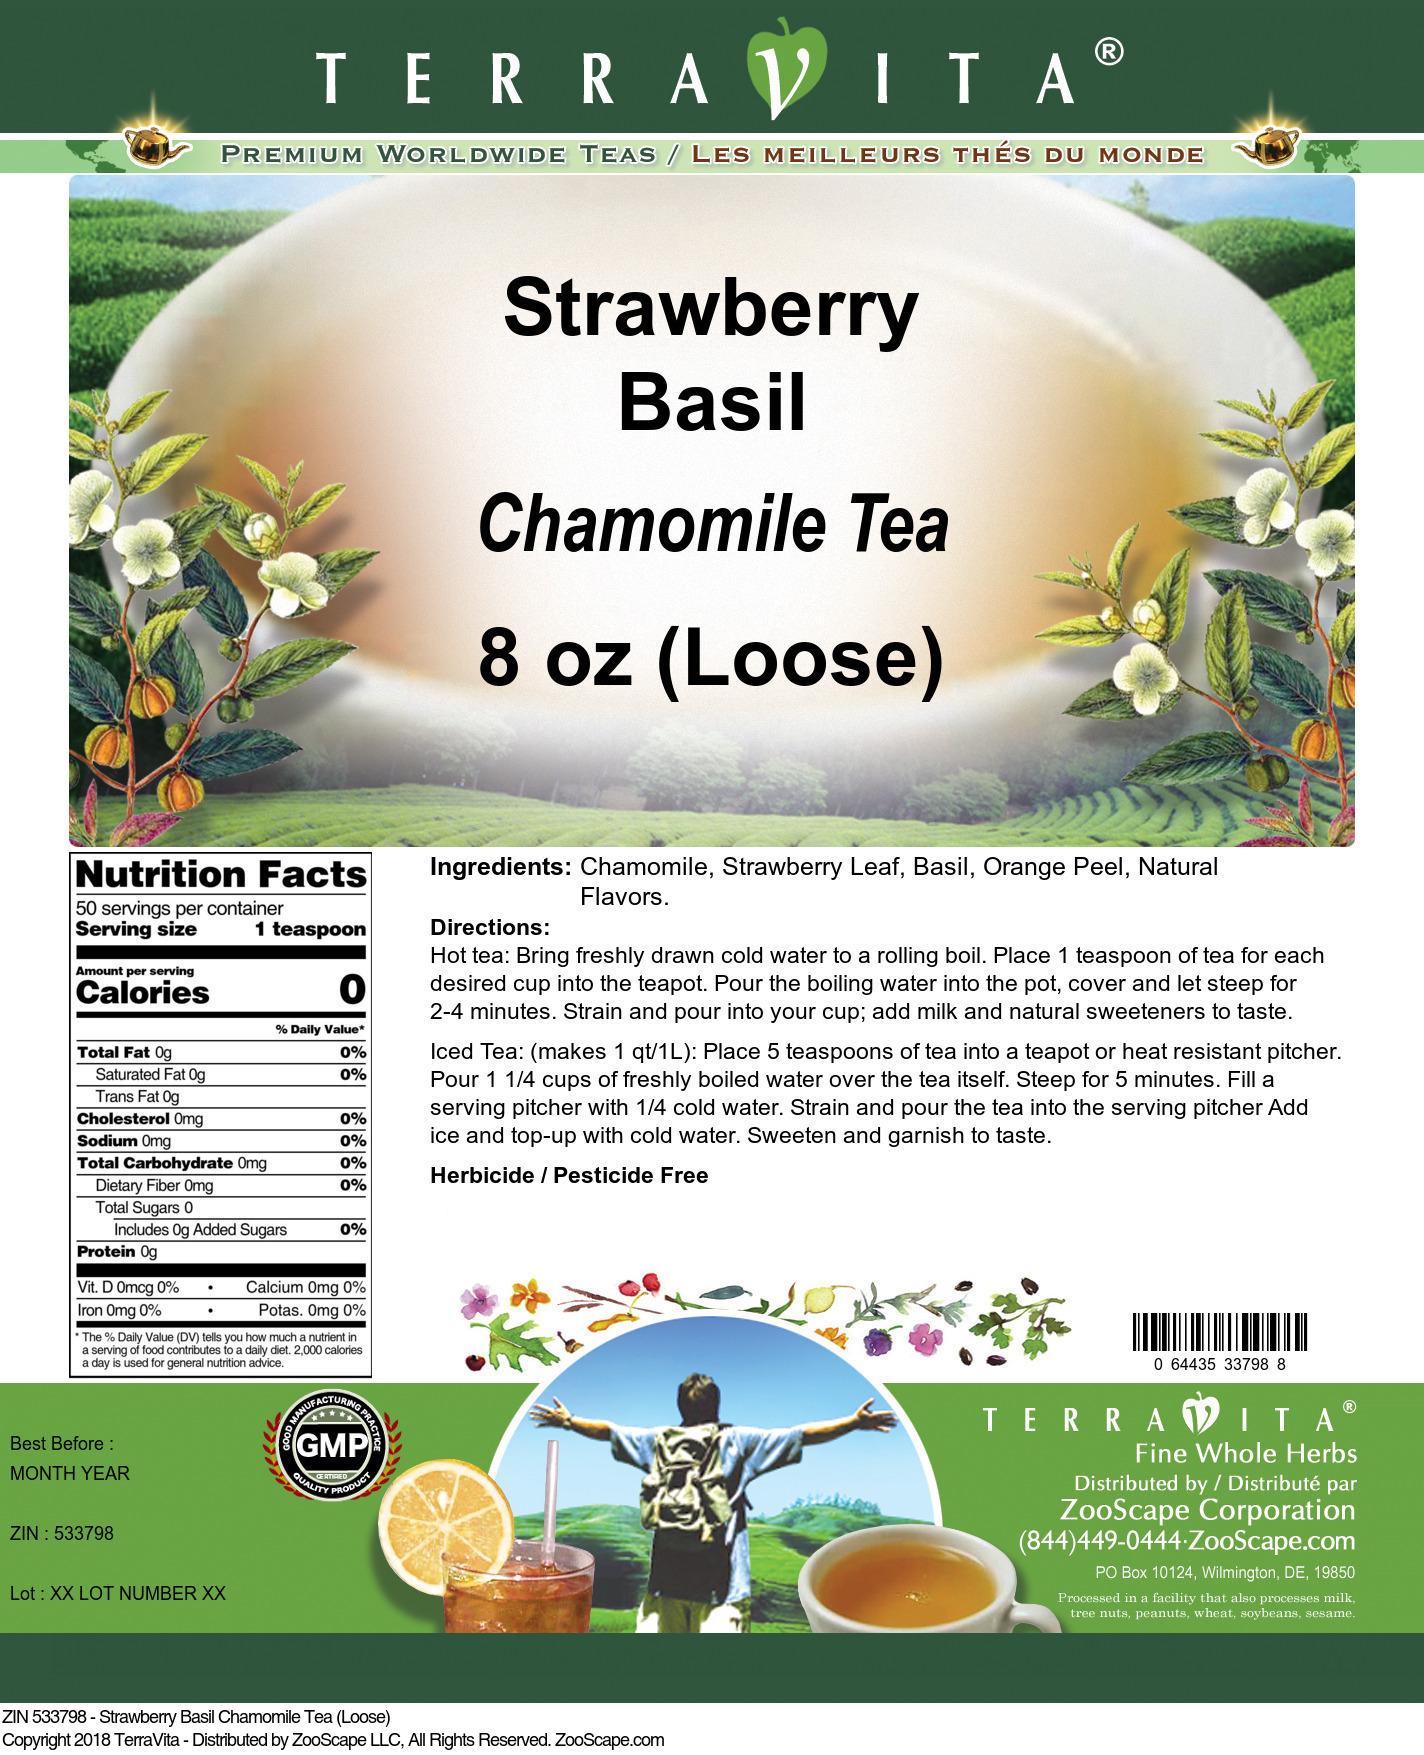 Strawberry Basil Chamomile Tea